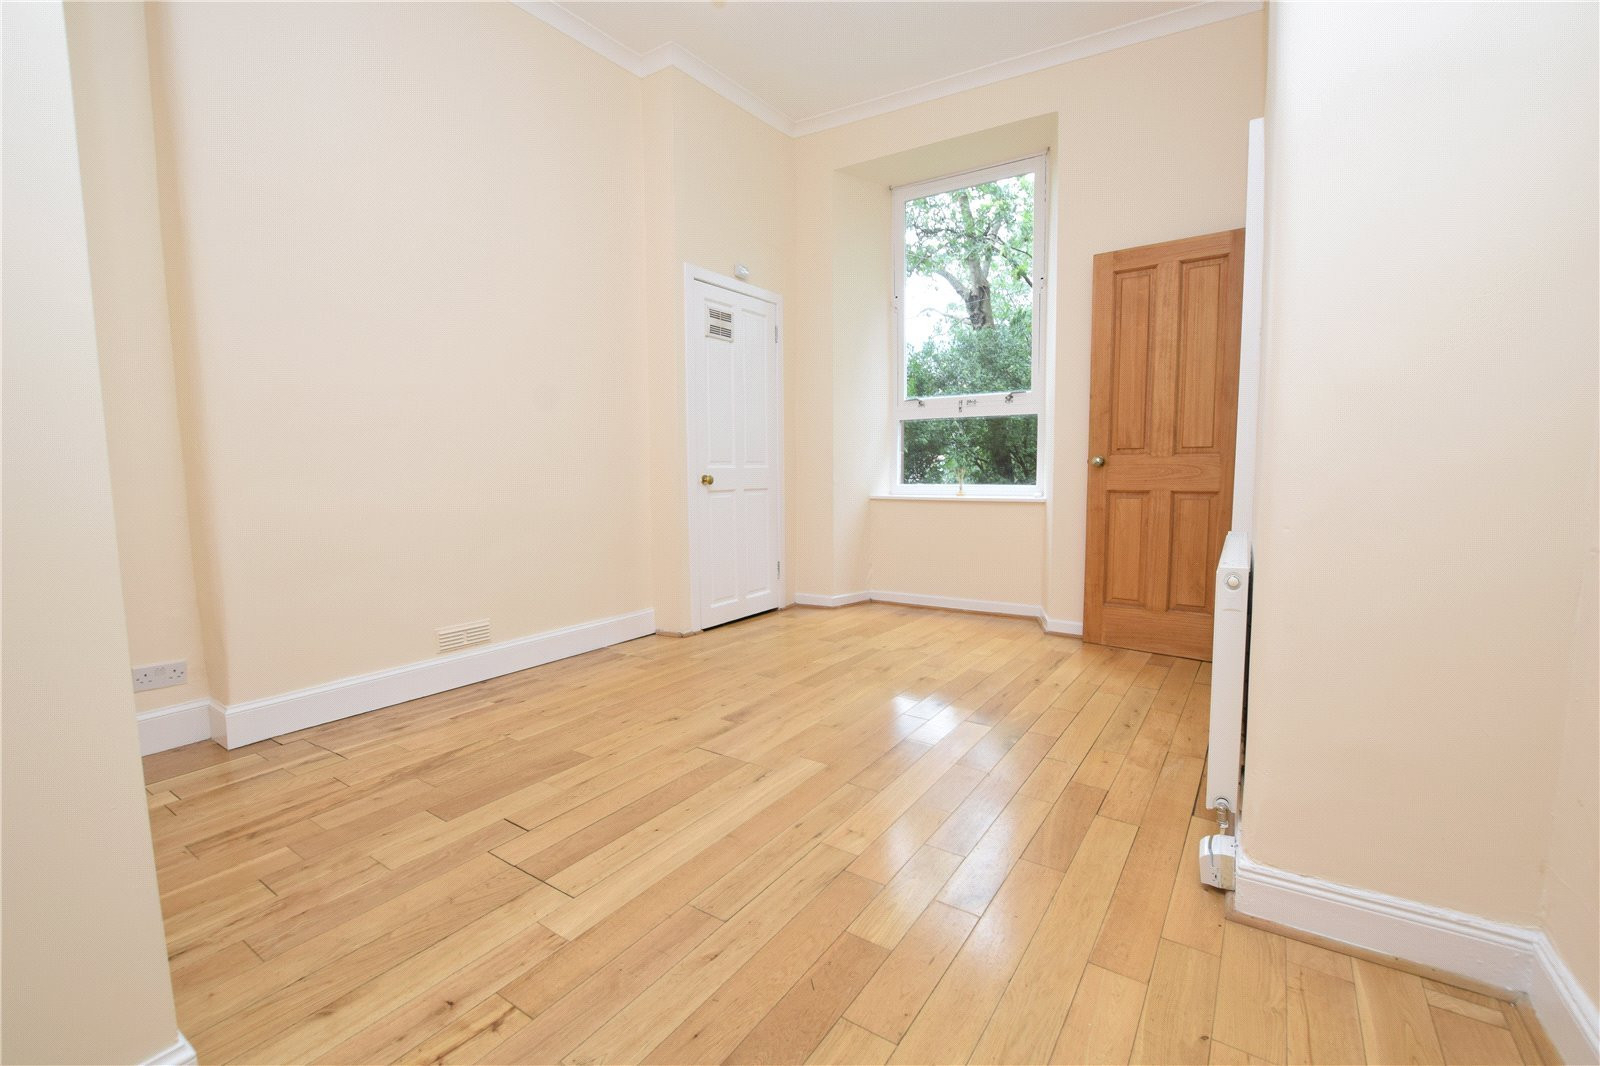 hardwood flooring newcastle upon tyne of 0 1 13 thornwood drive thornwood glasgow g11 7ts regarding type